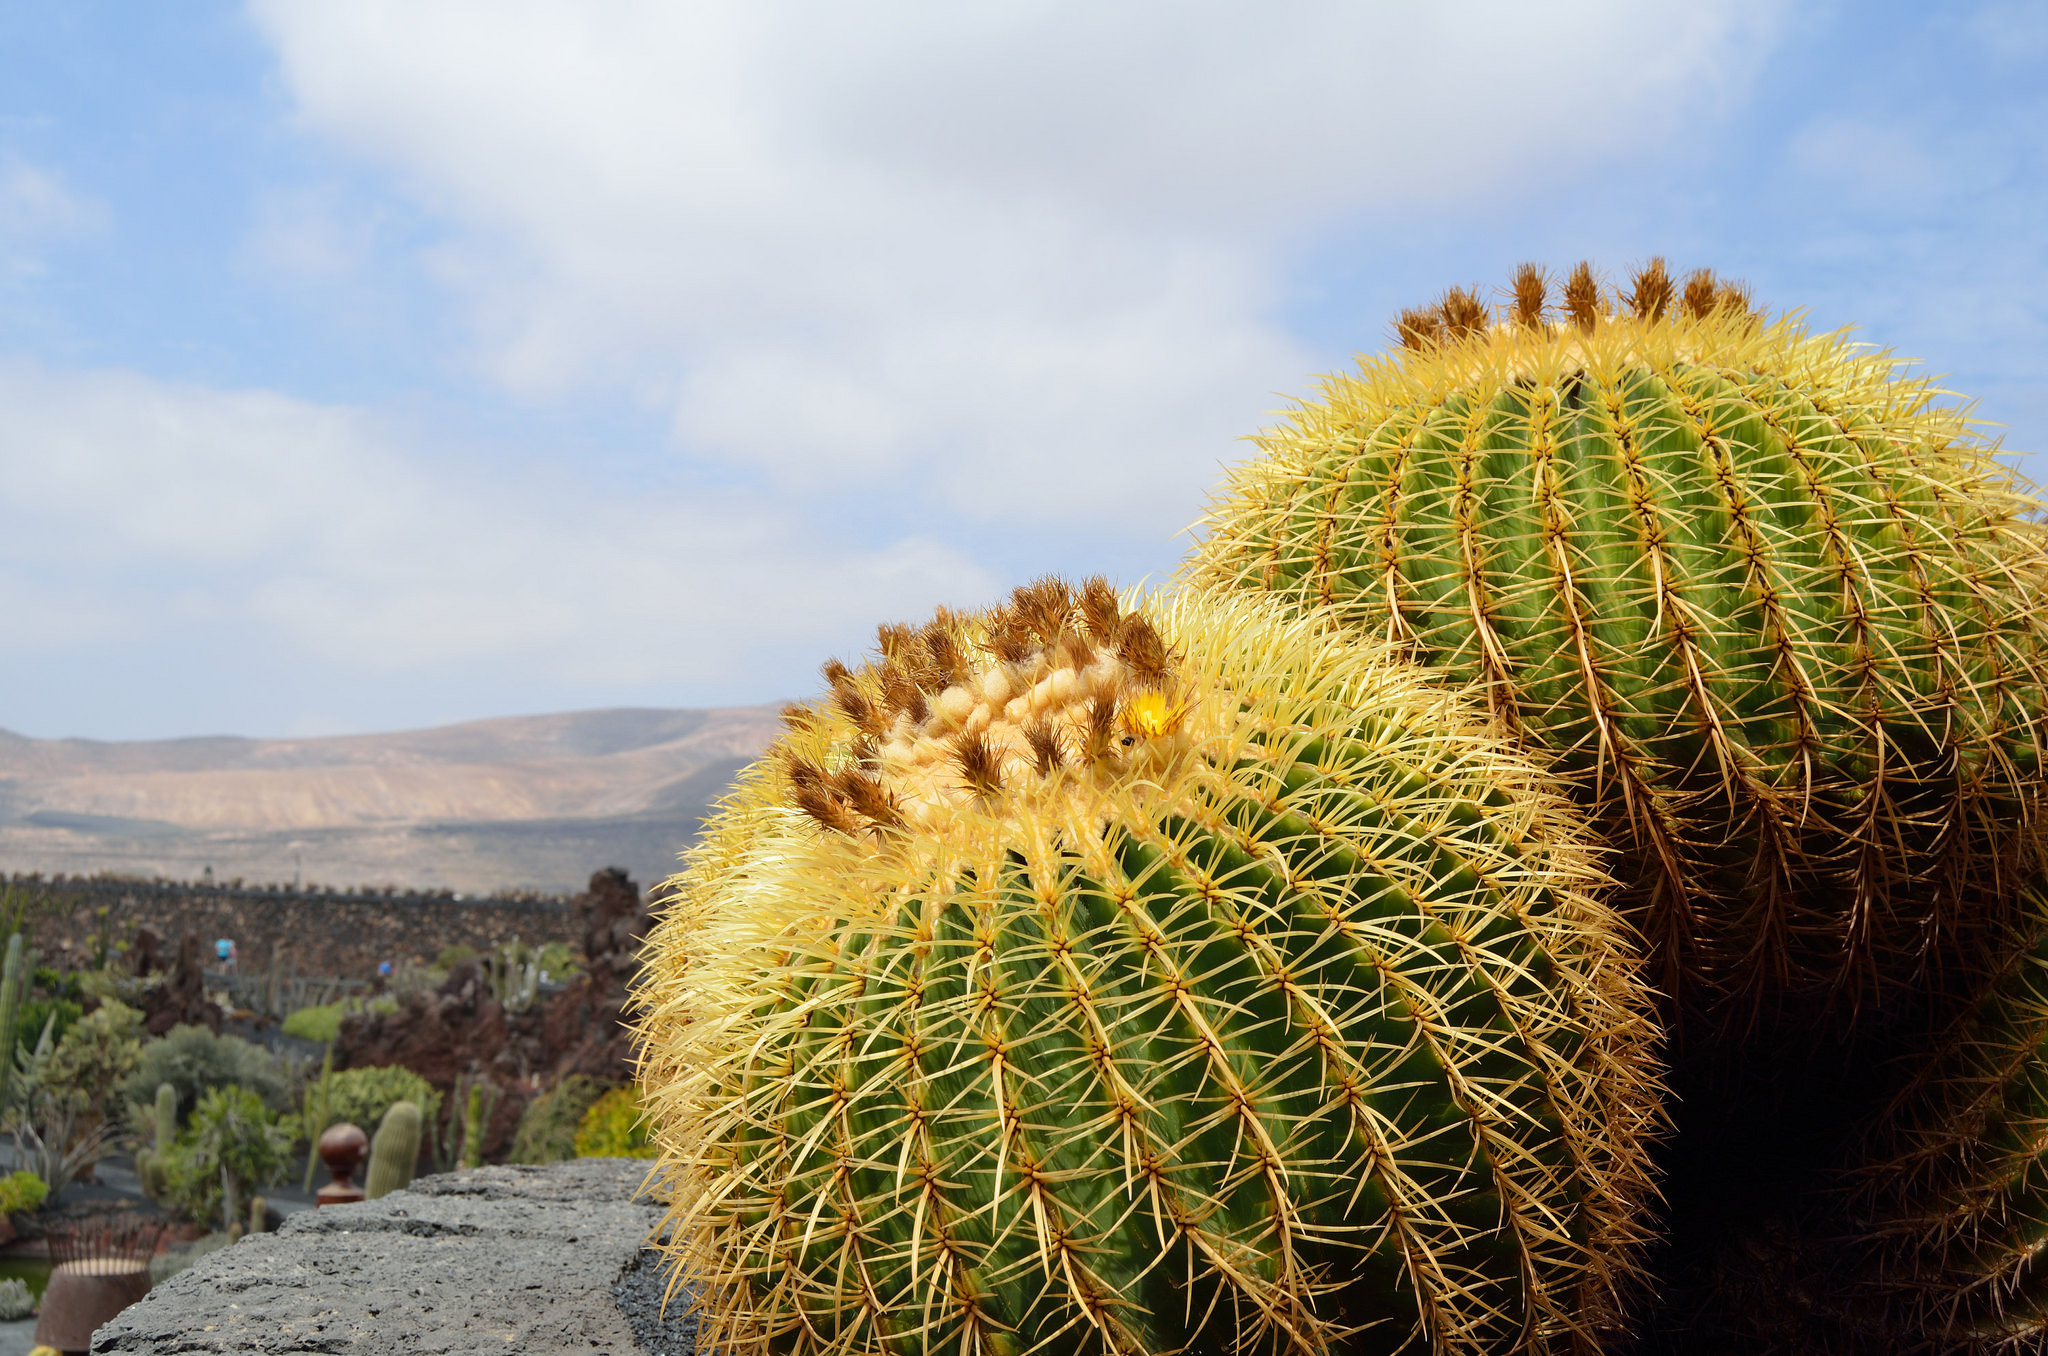 © Julen Ruiz Luzuriaga/Flickr.com